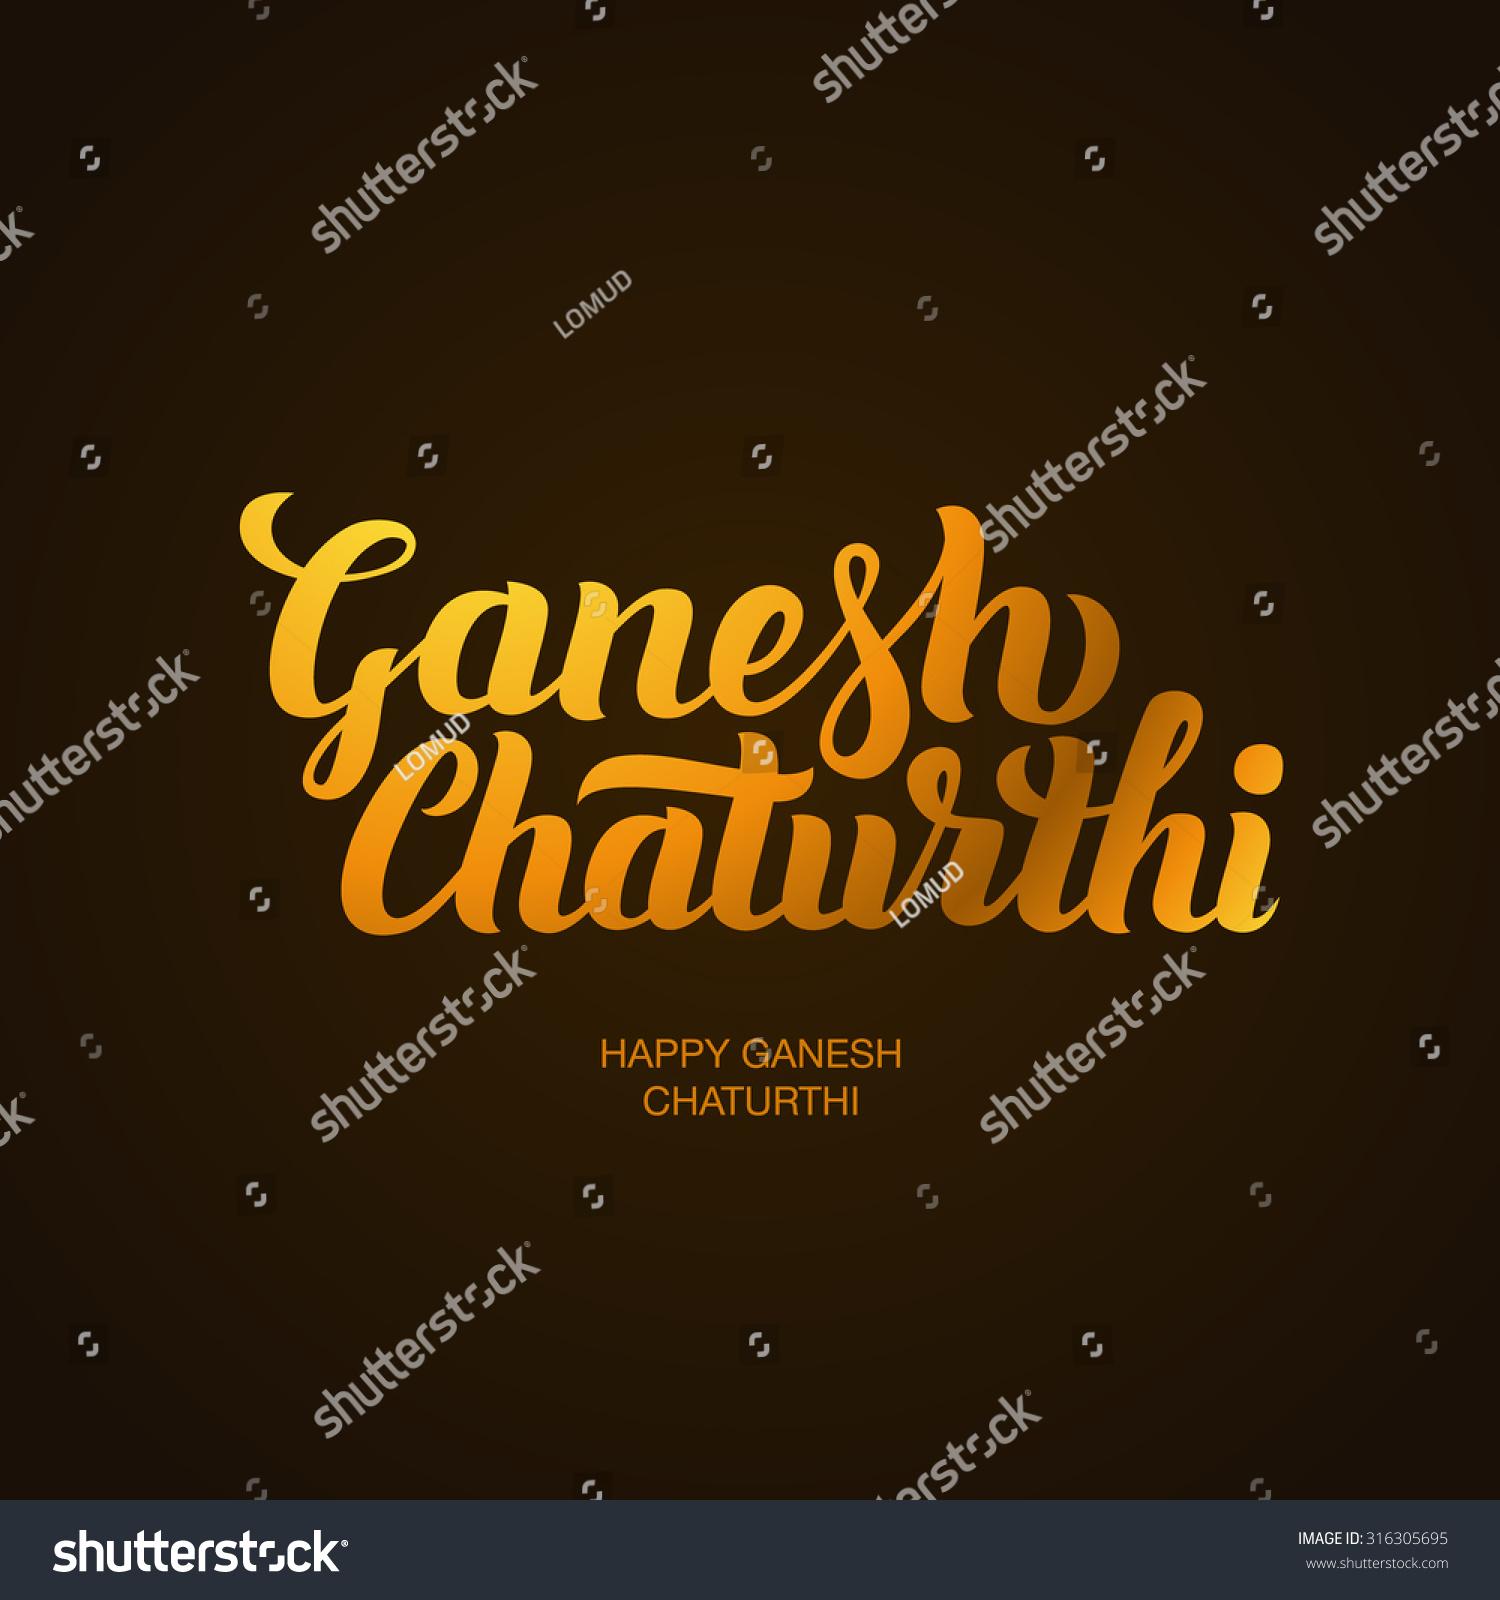 Ganesh Chaturthi Handlettering Indian Festival Greeting Stock Vector